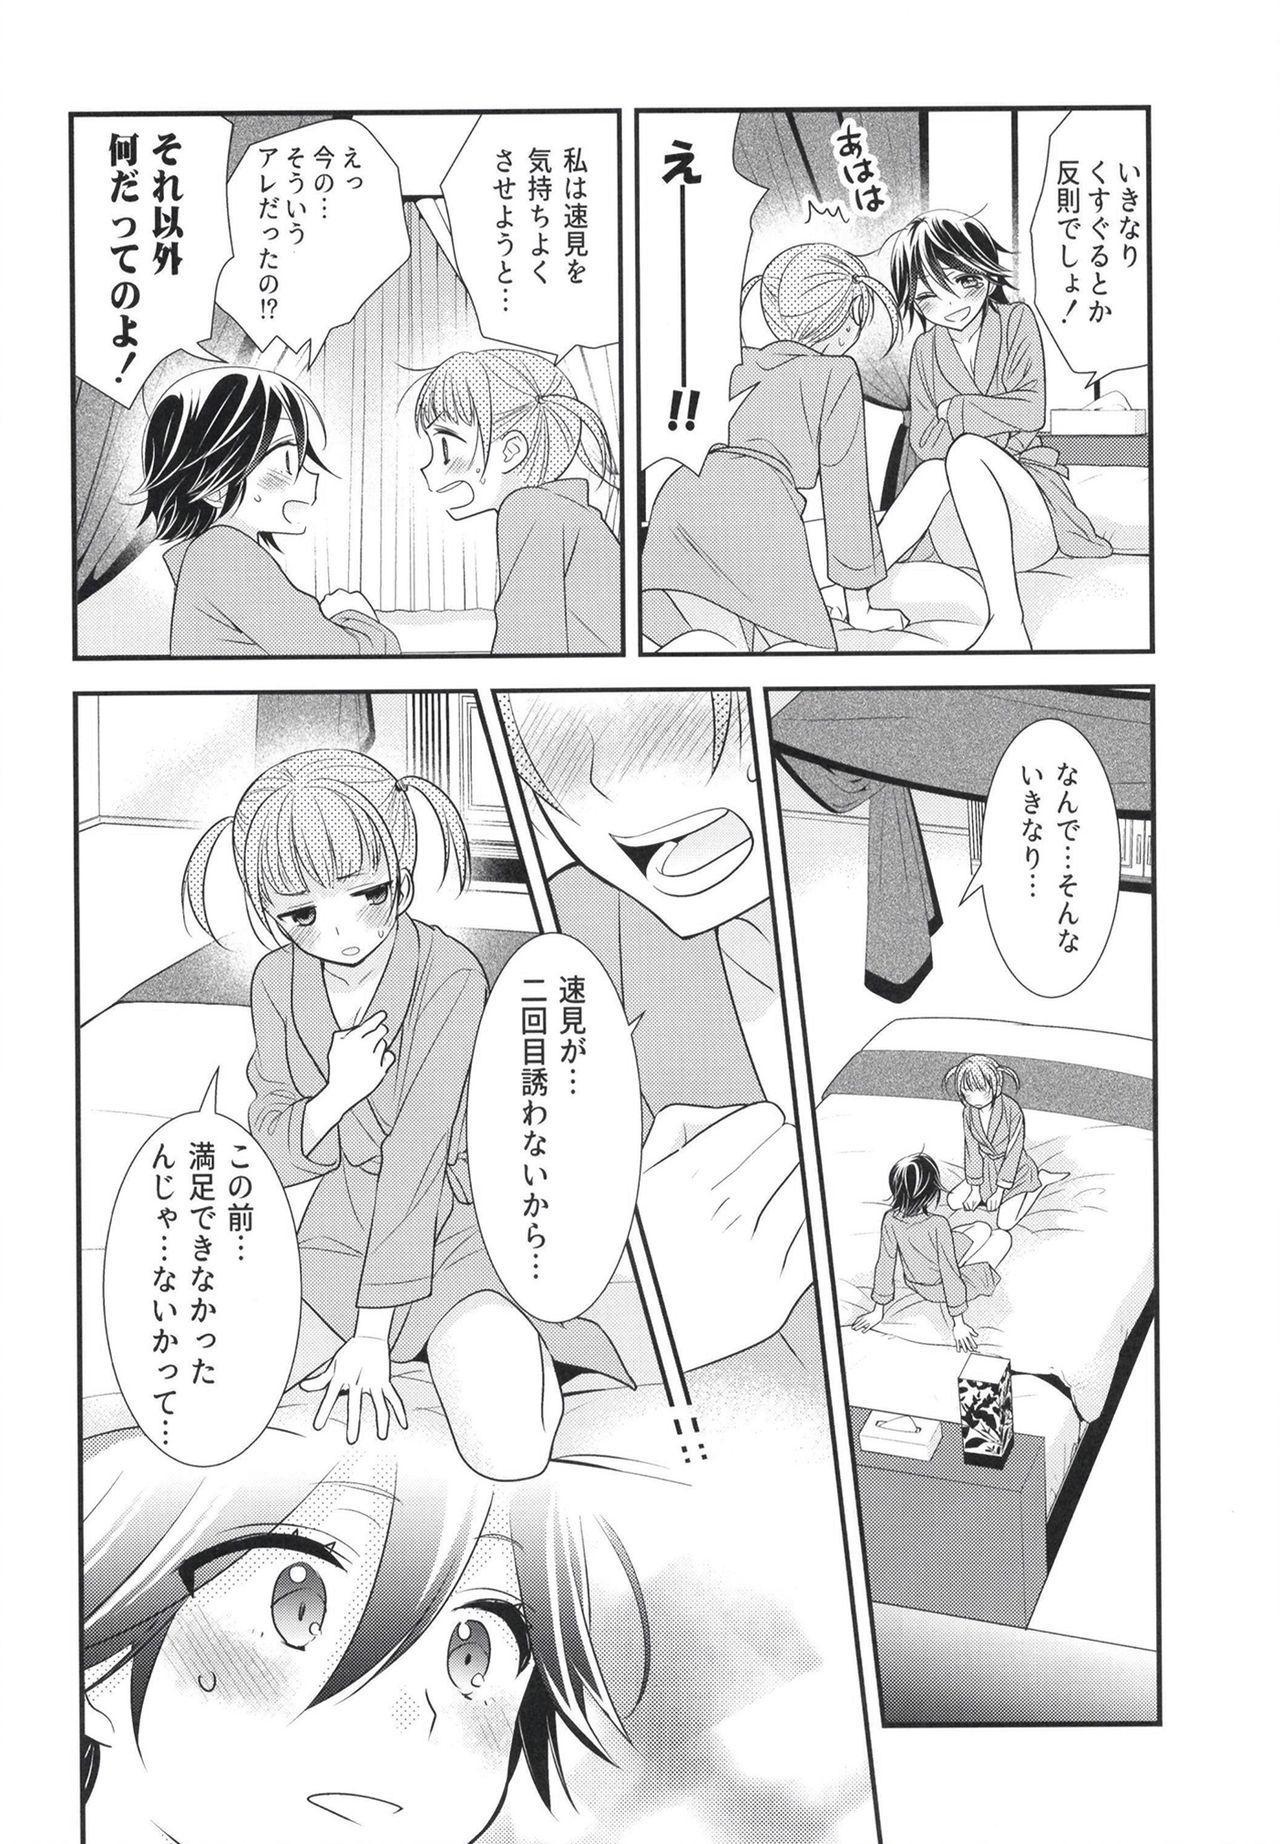 Sawarukara, Sawatte. 17